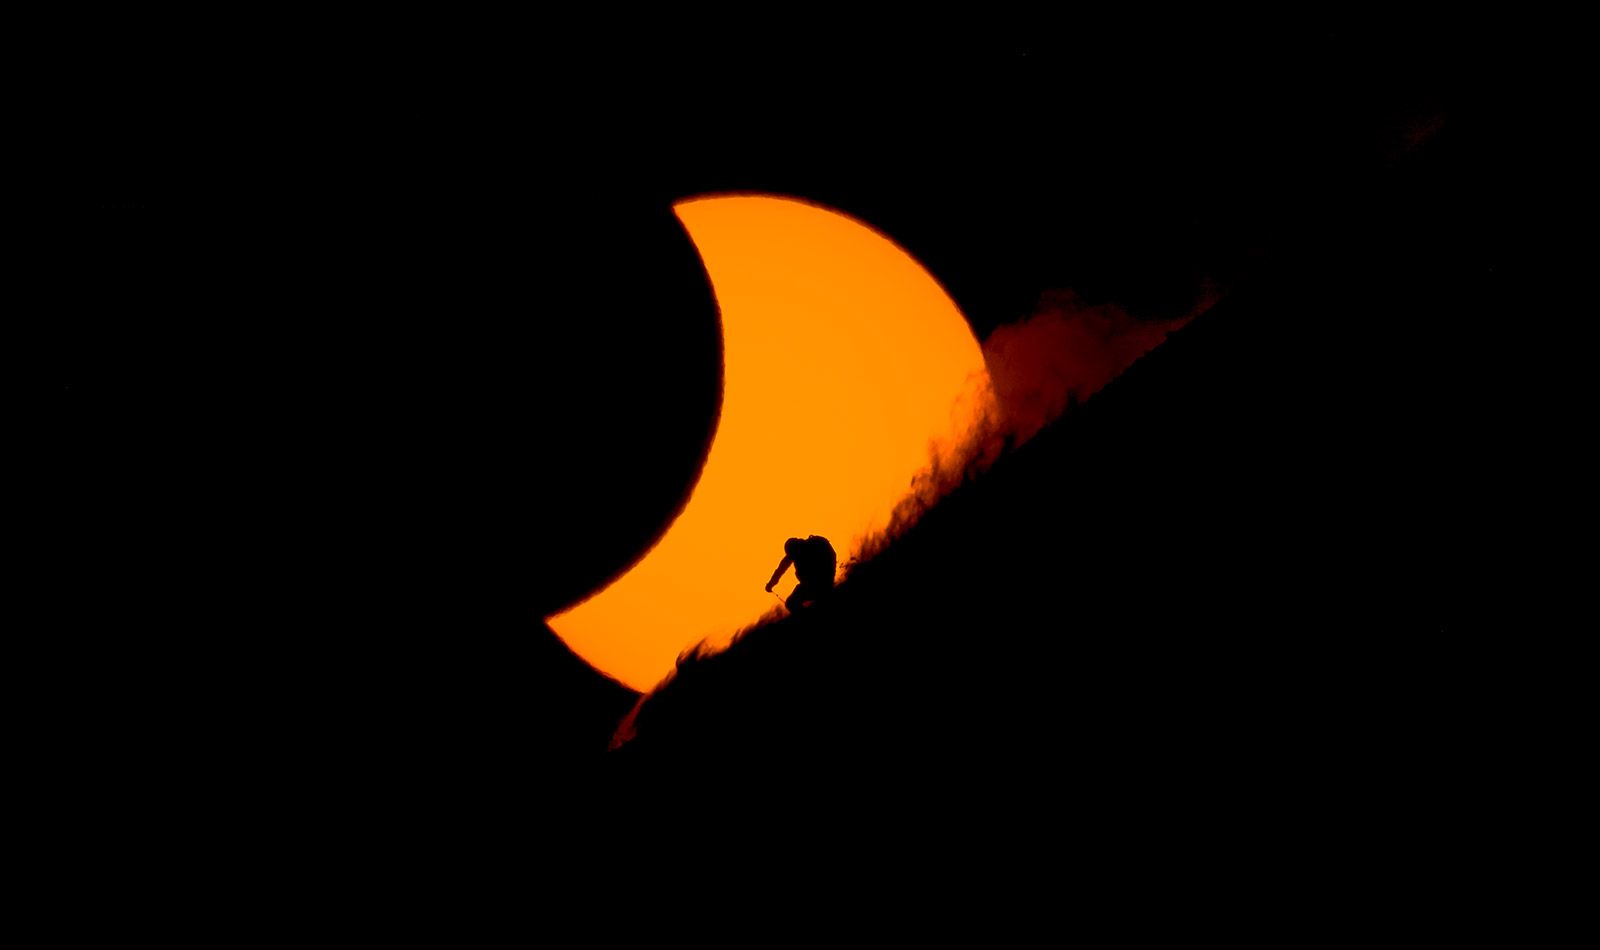 http://www.sidetracked.com/wp-content/uploads/2016/03/150320-svalbard-eclipse-Reuben-Krabbe3.jpg